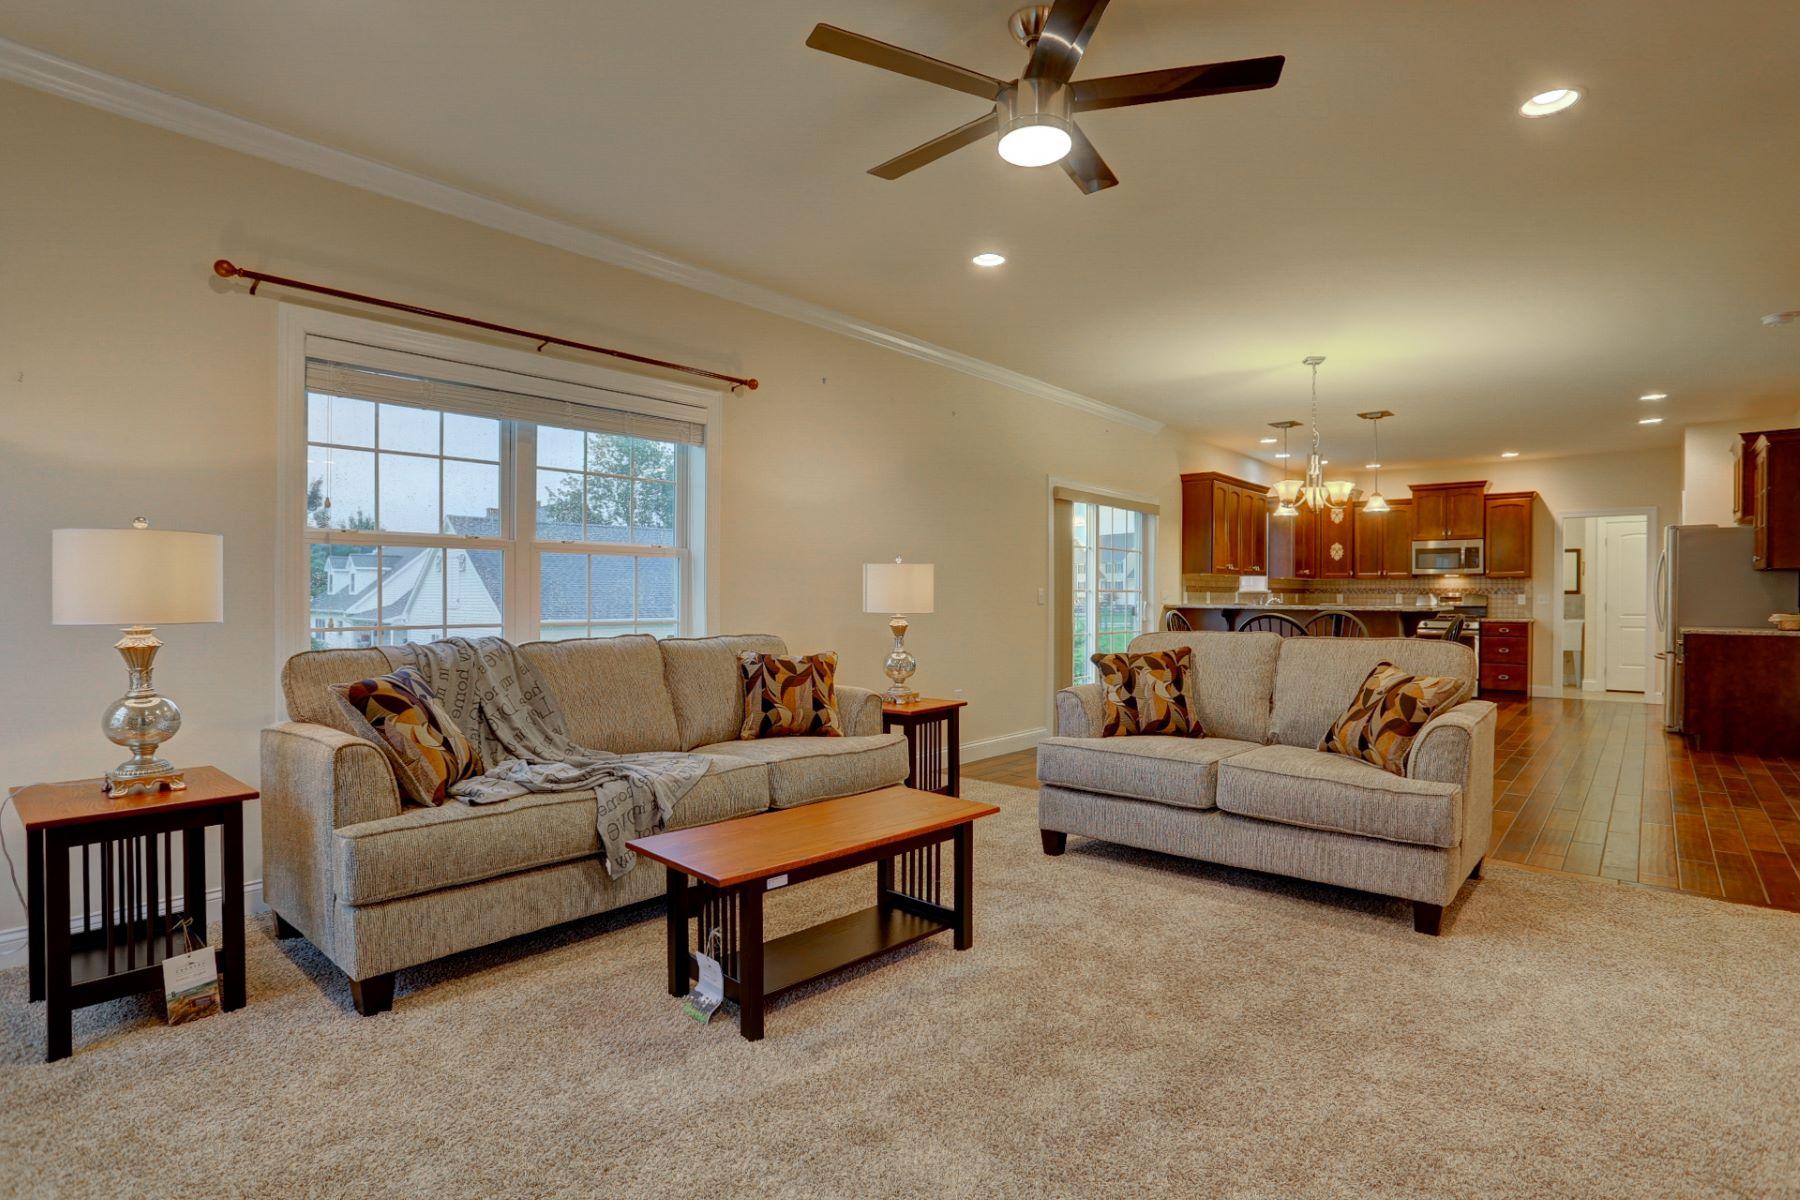 Additional photo for property listing at 631 Frome Avenue  Lititz, Pennsylvania 17543 Estados Unidos